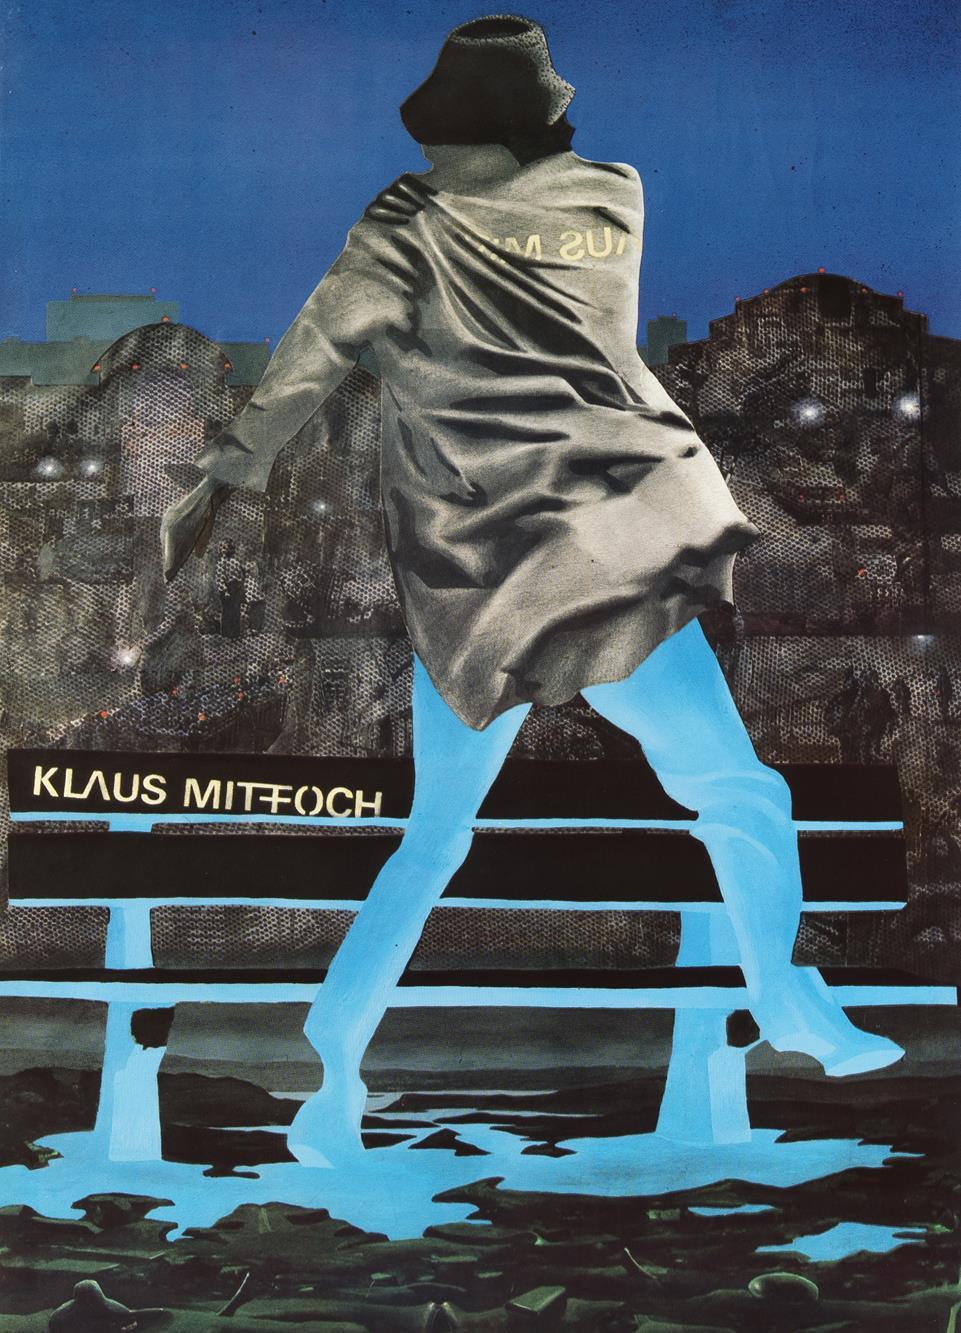 Klaus Mitffoch, 1984, poster. Design: Artur Gołacki, cooperation Andrzej Rogowski. Courtesy of Andrzej Rogowski